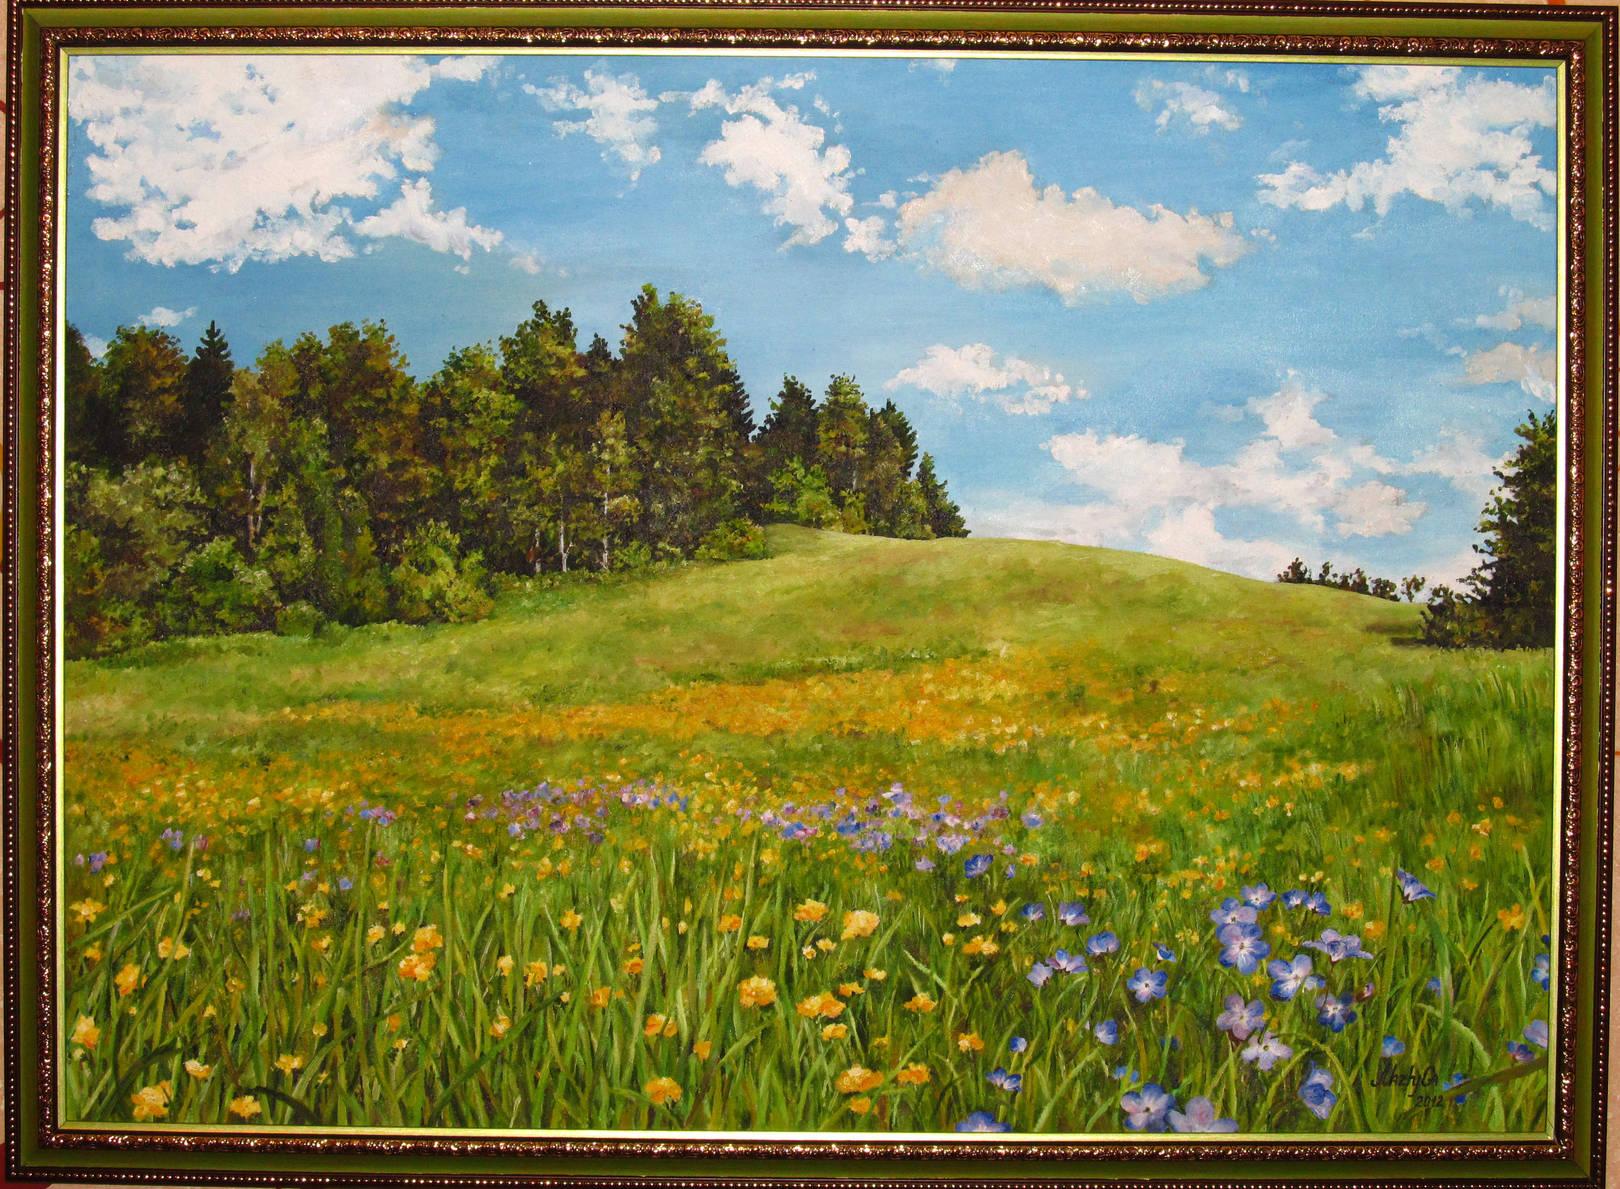 """Цветущее полее"" Пейзаж. Масло, холст, размер 103х76 см."